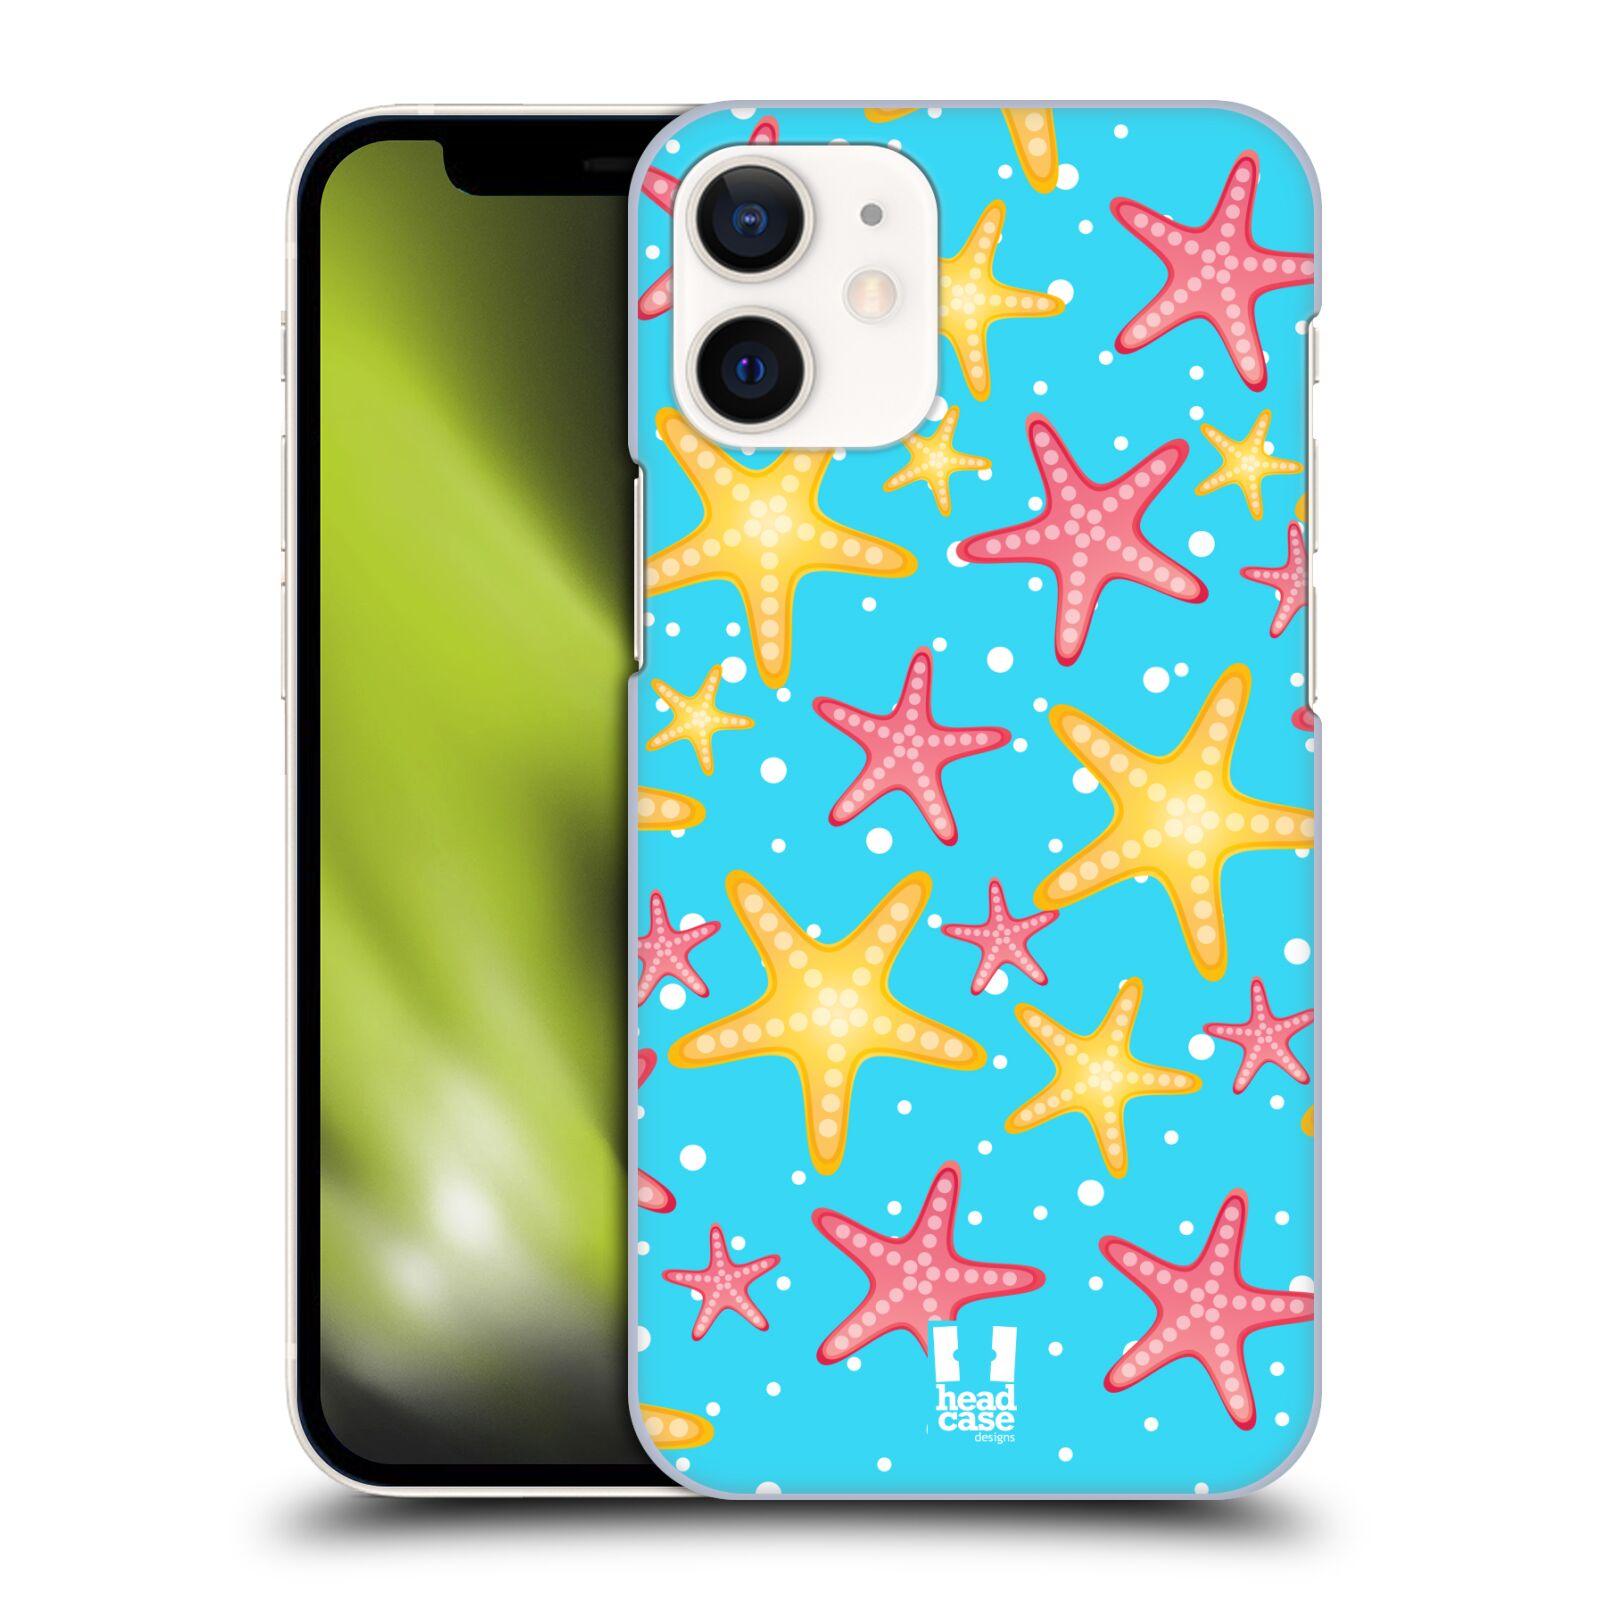 Plastový obal na mobil Apple Iphone 12 MINI vzor mořský živočich hvězda